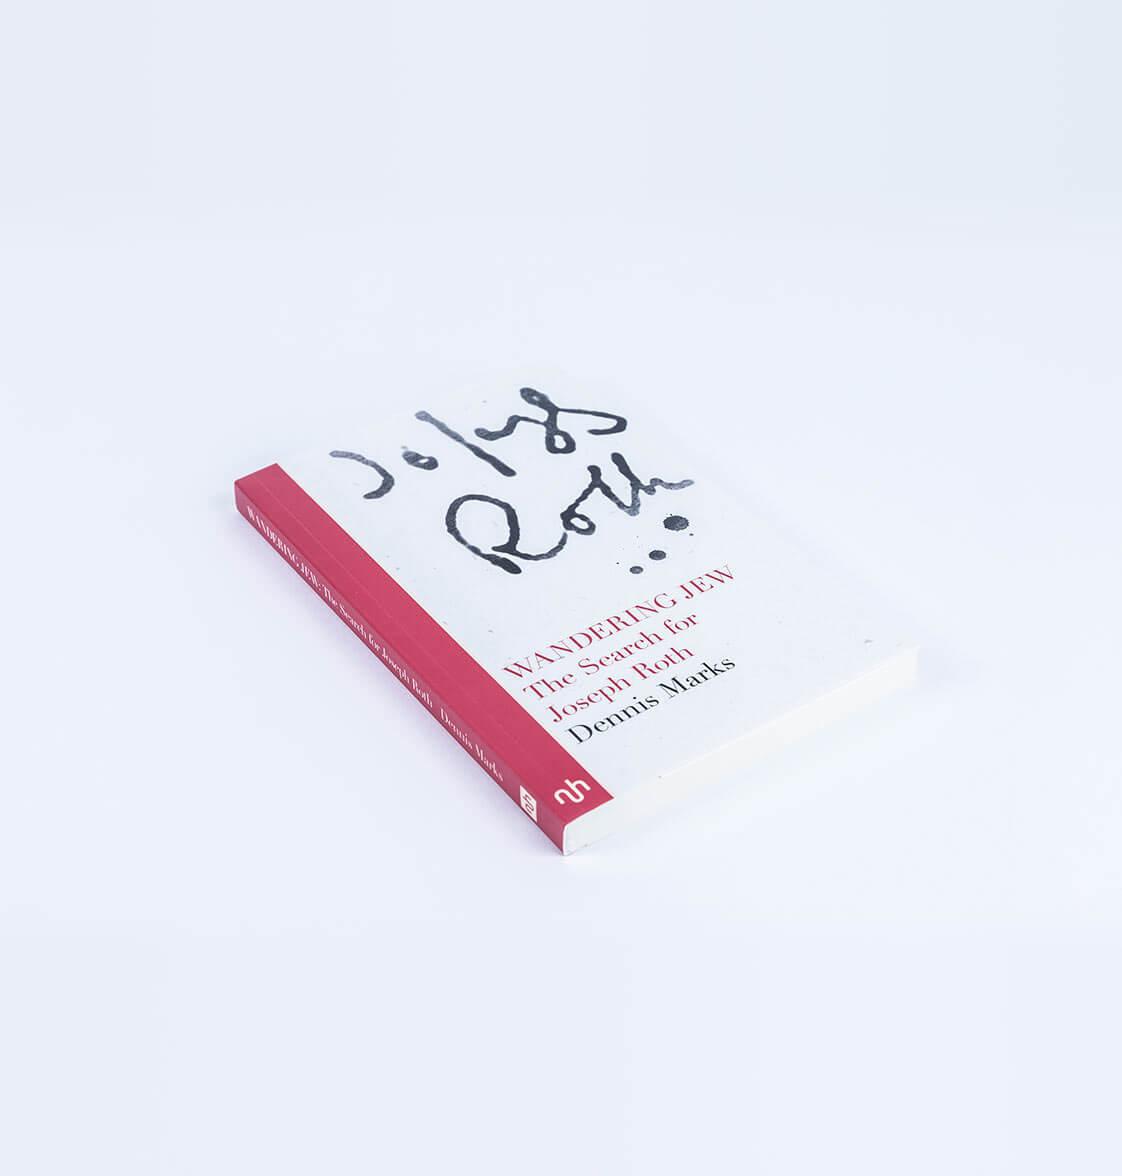 Wandering-Jew-Paperback